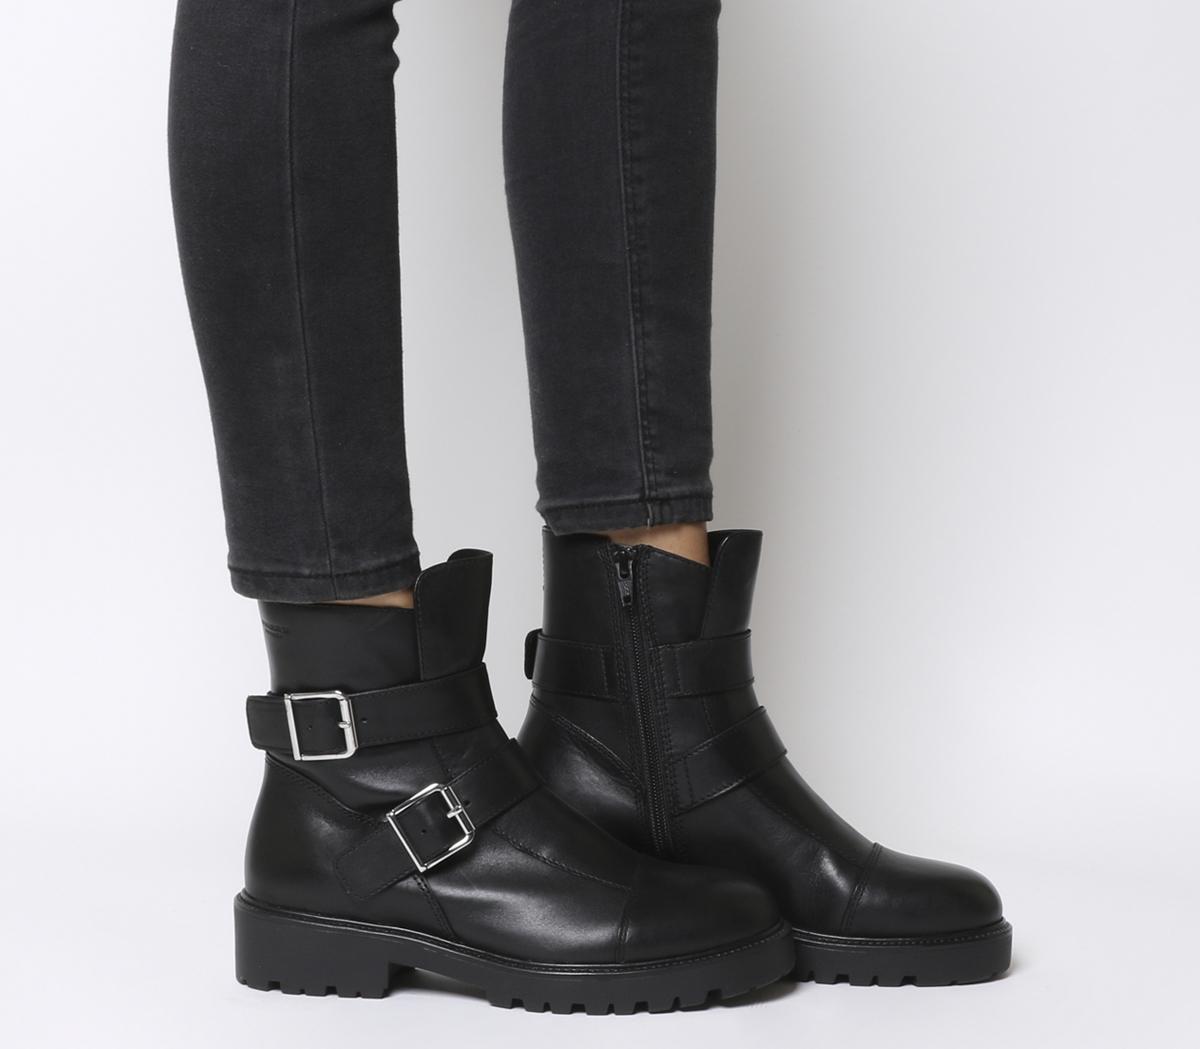 Vagabond Womens Meja Leather Buckle Zip Boot Black